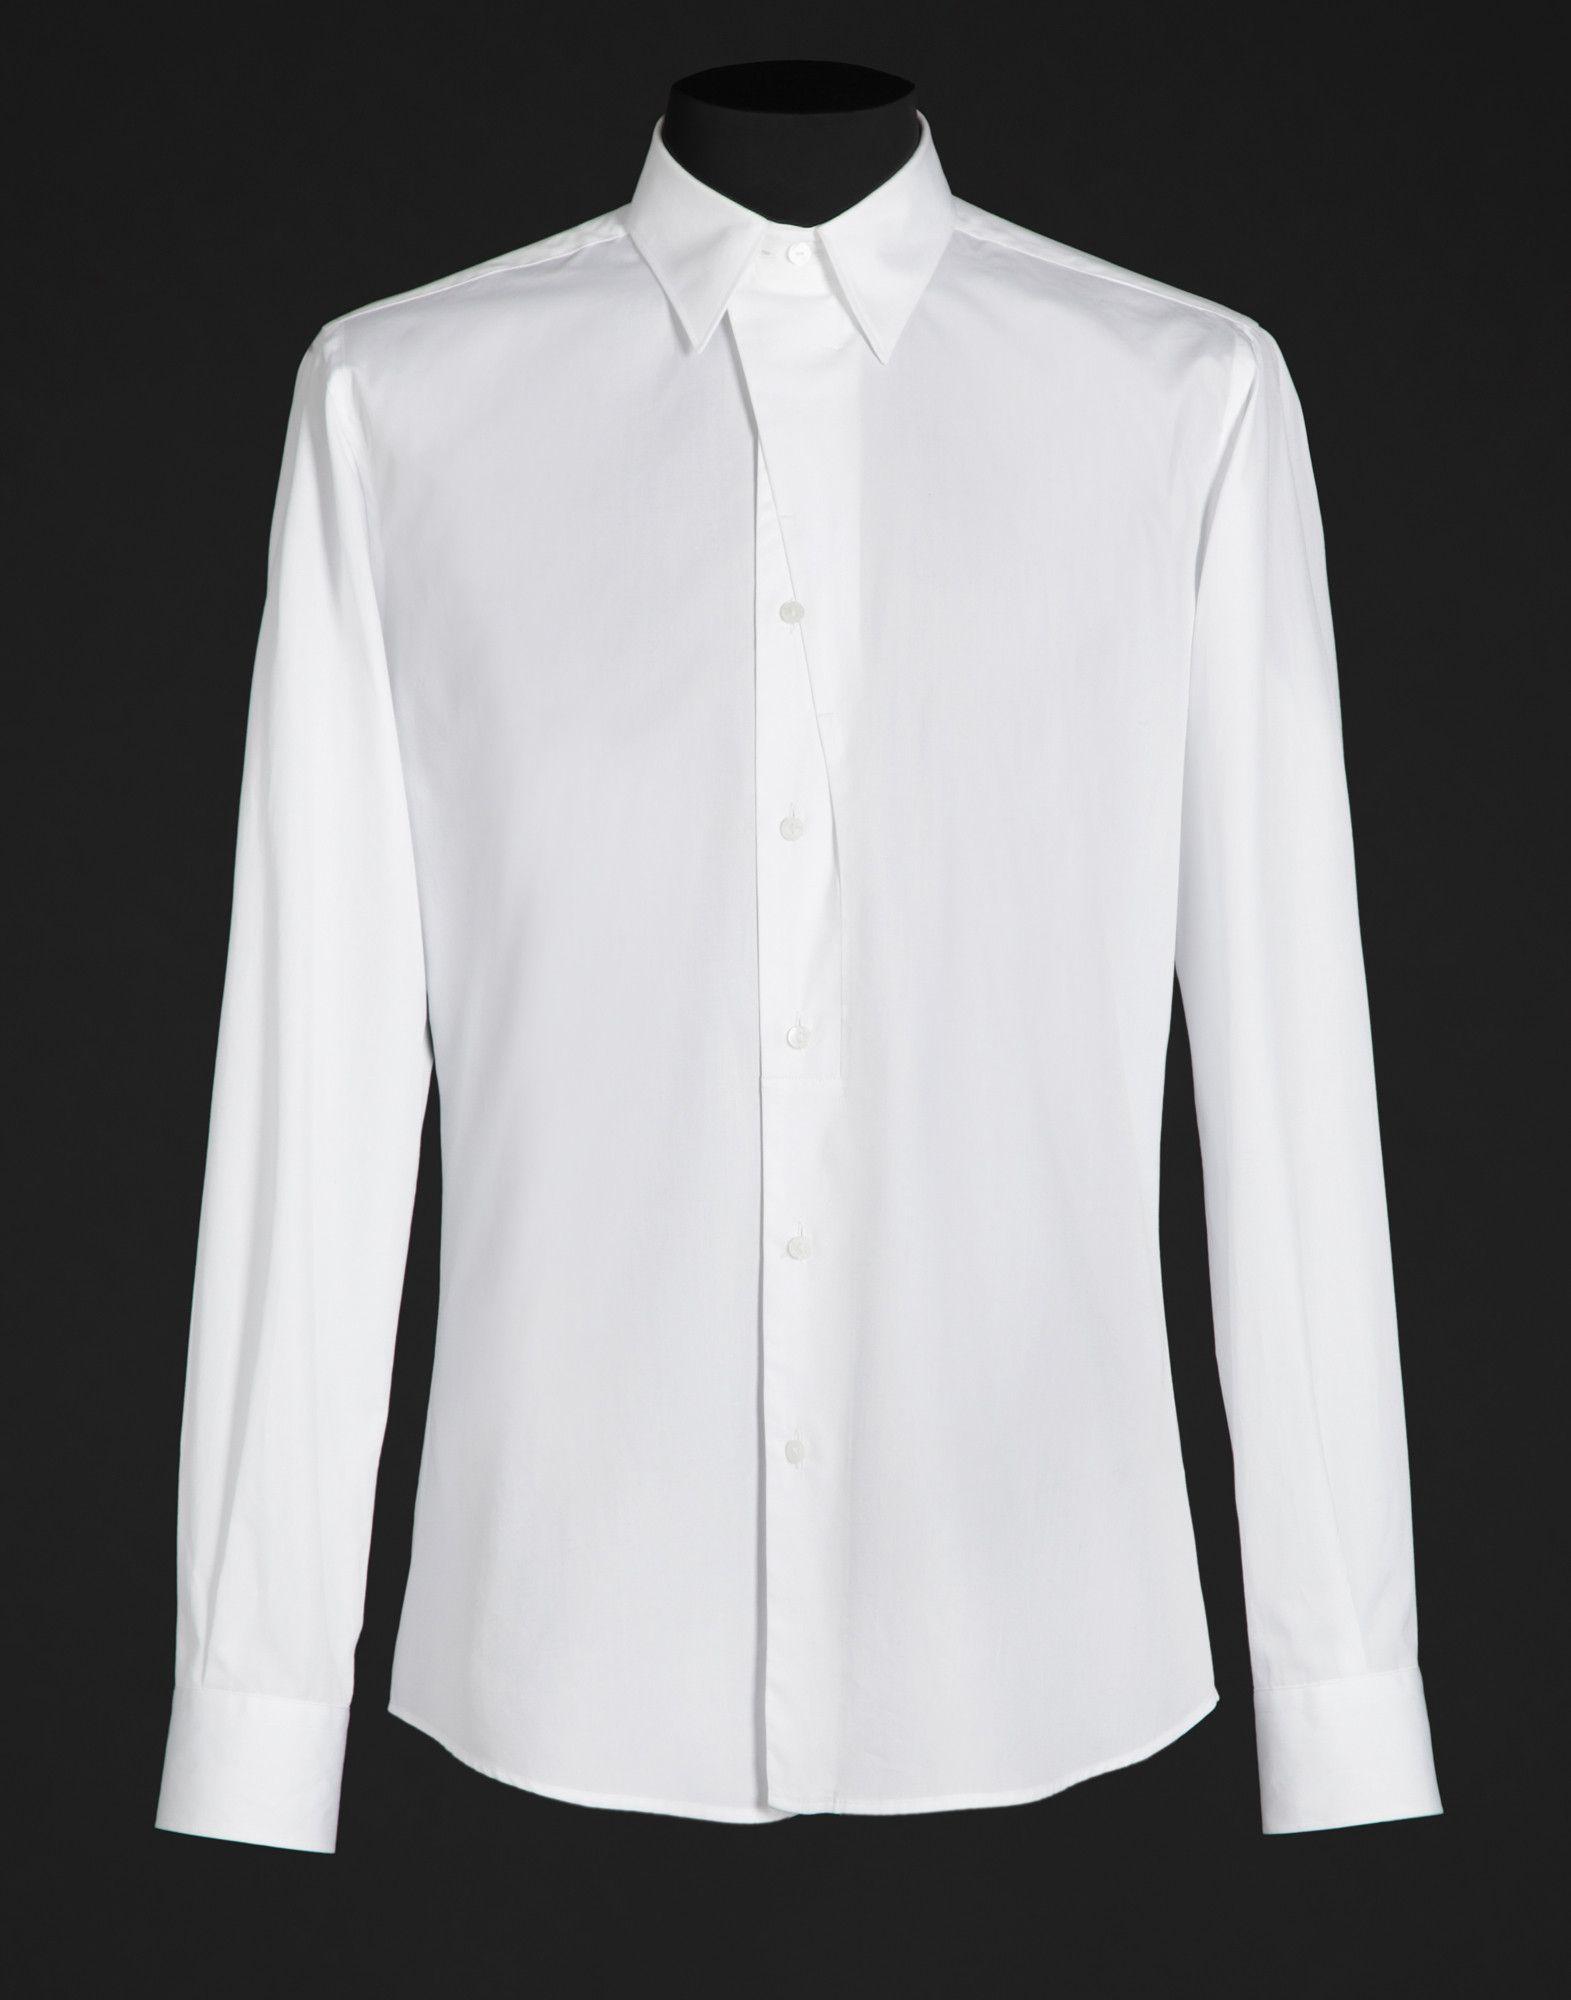 Dolce Gabbana White Dress Shirt This Is The Perfect White Shirt